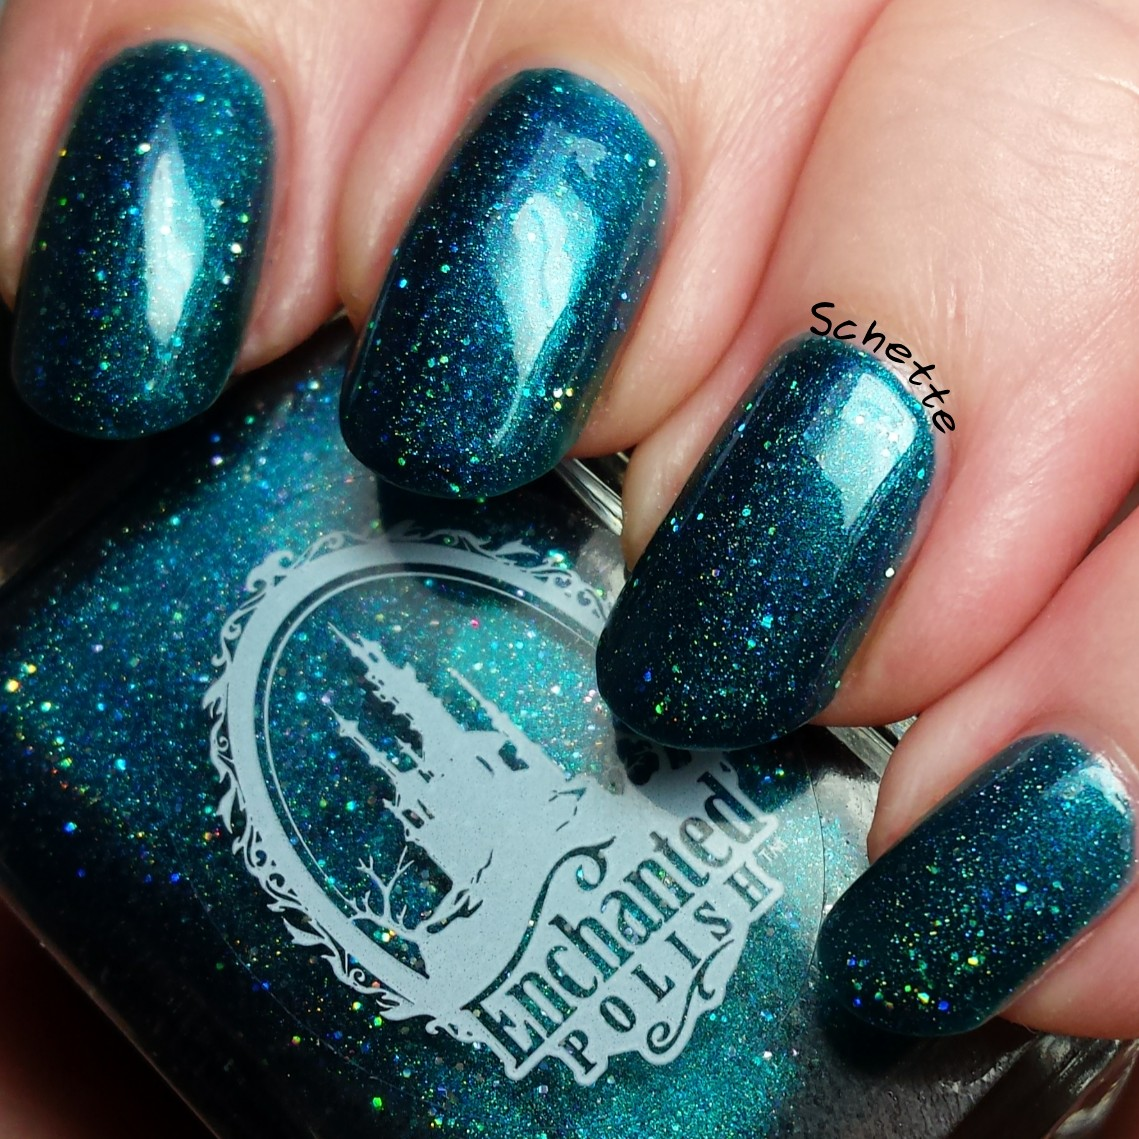 Enchanted Polish : Neptune, December 2015, Holiday 2015